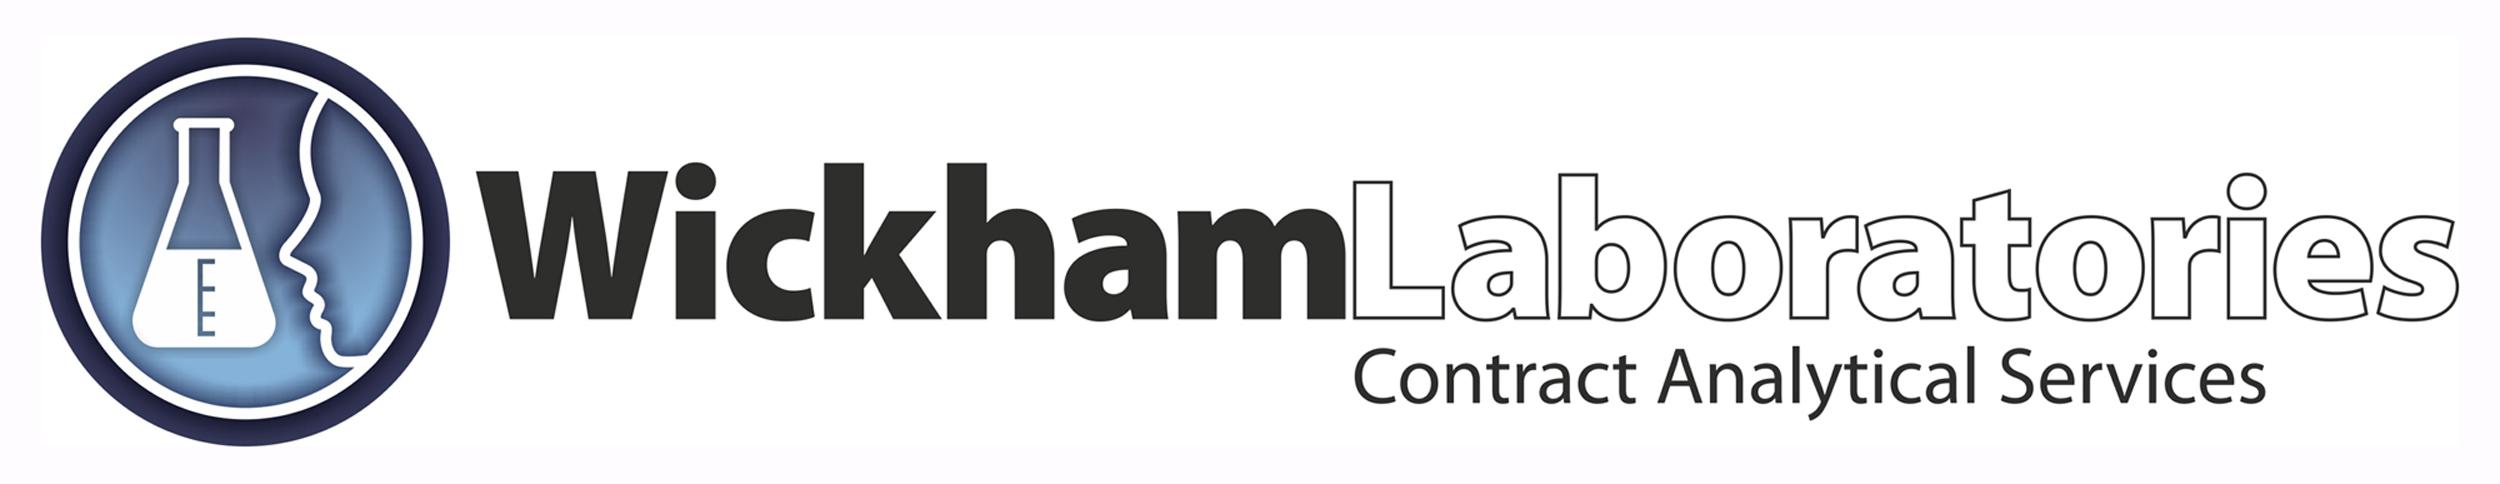 Wickham_Logo1.jpg